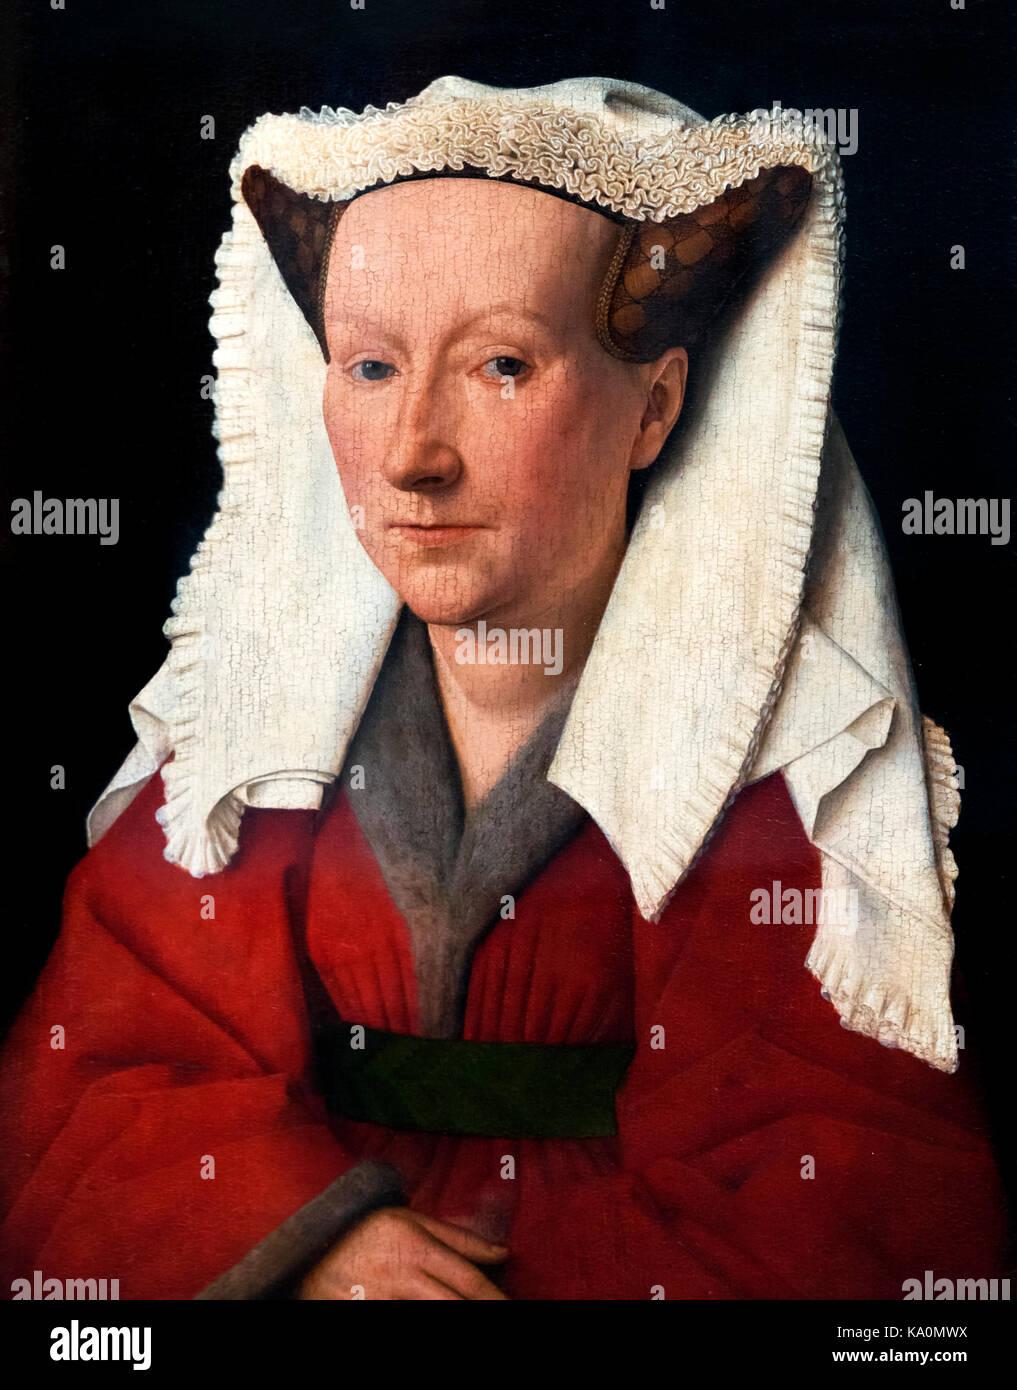 Portrait of Margareta van Eyck by Jan van Eyck (c.1390-1441), oil on panel, 1439. Van Eyck was an early Netherlandish - Stock Image